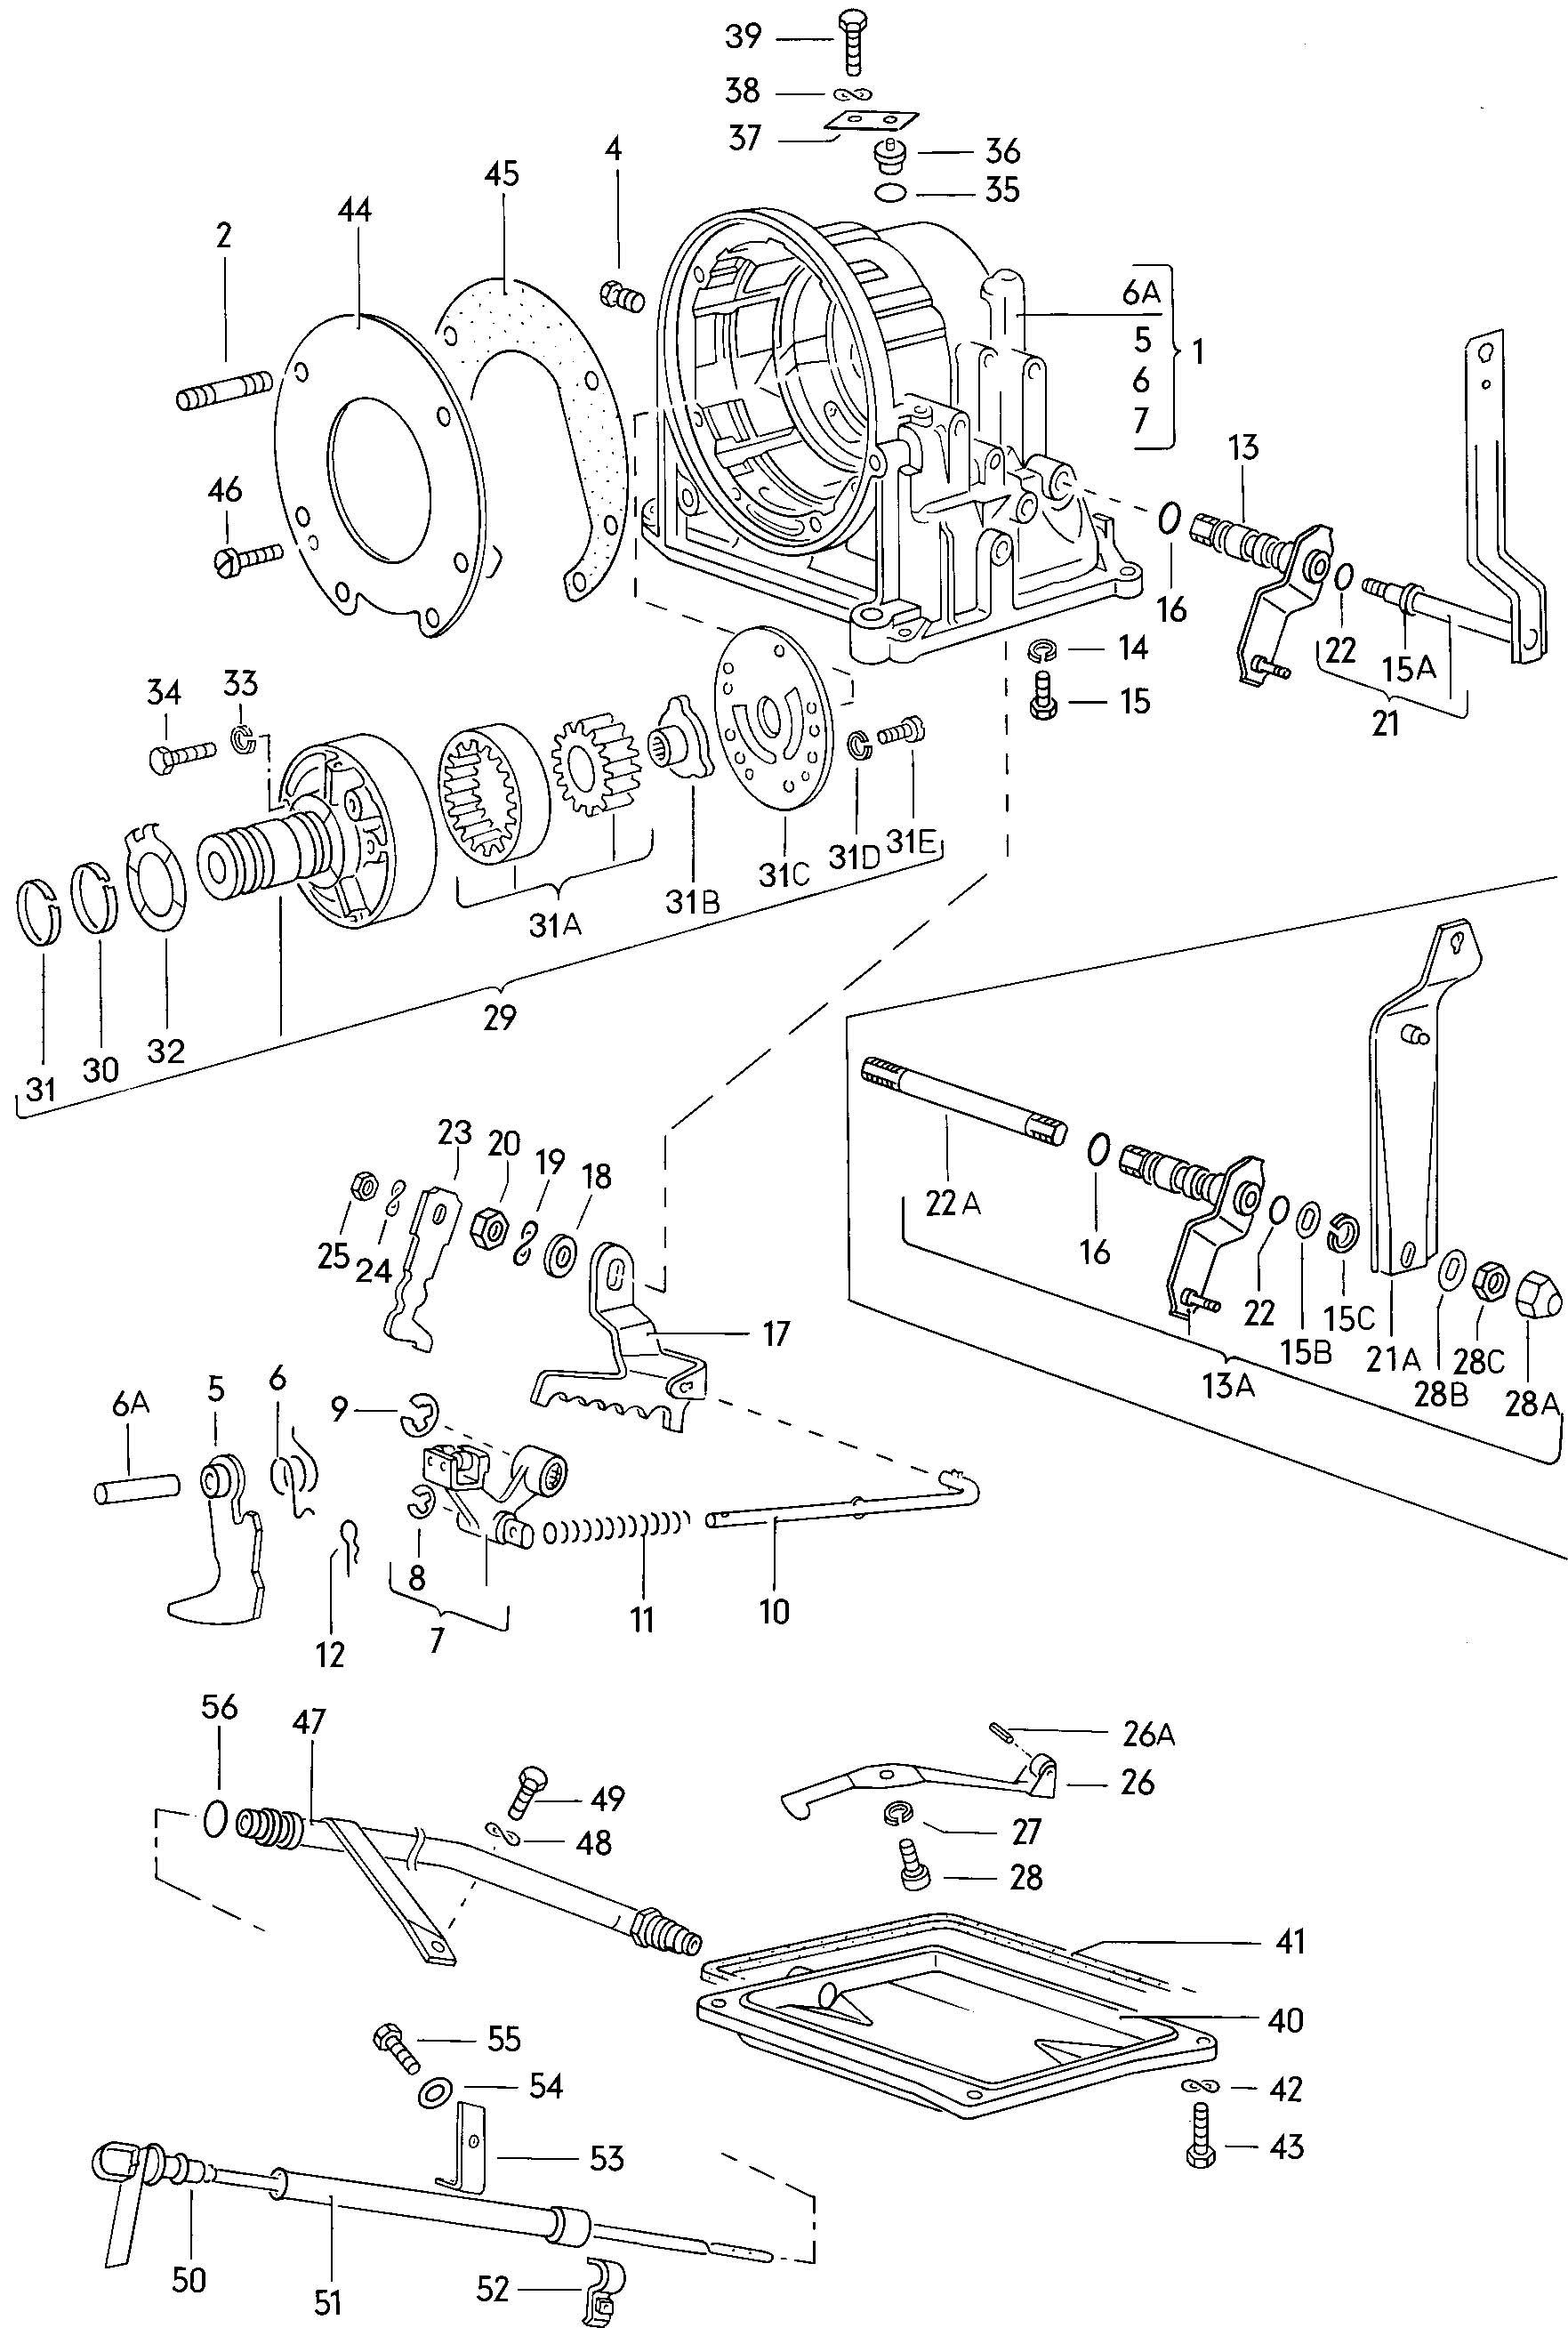 audi a4 2.0 fsi engine diagram